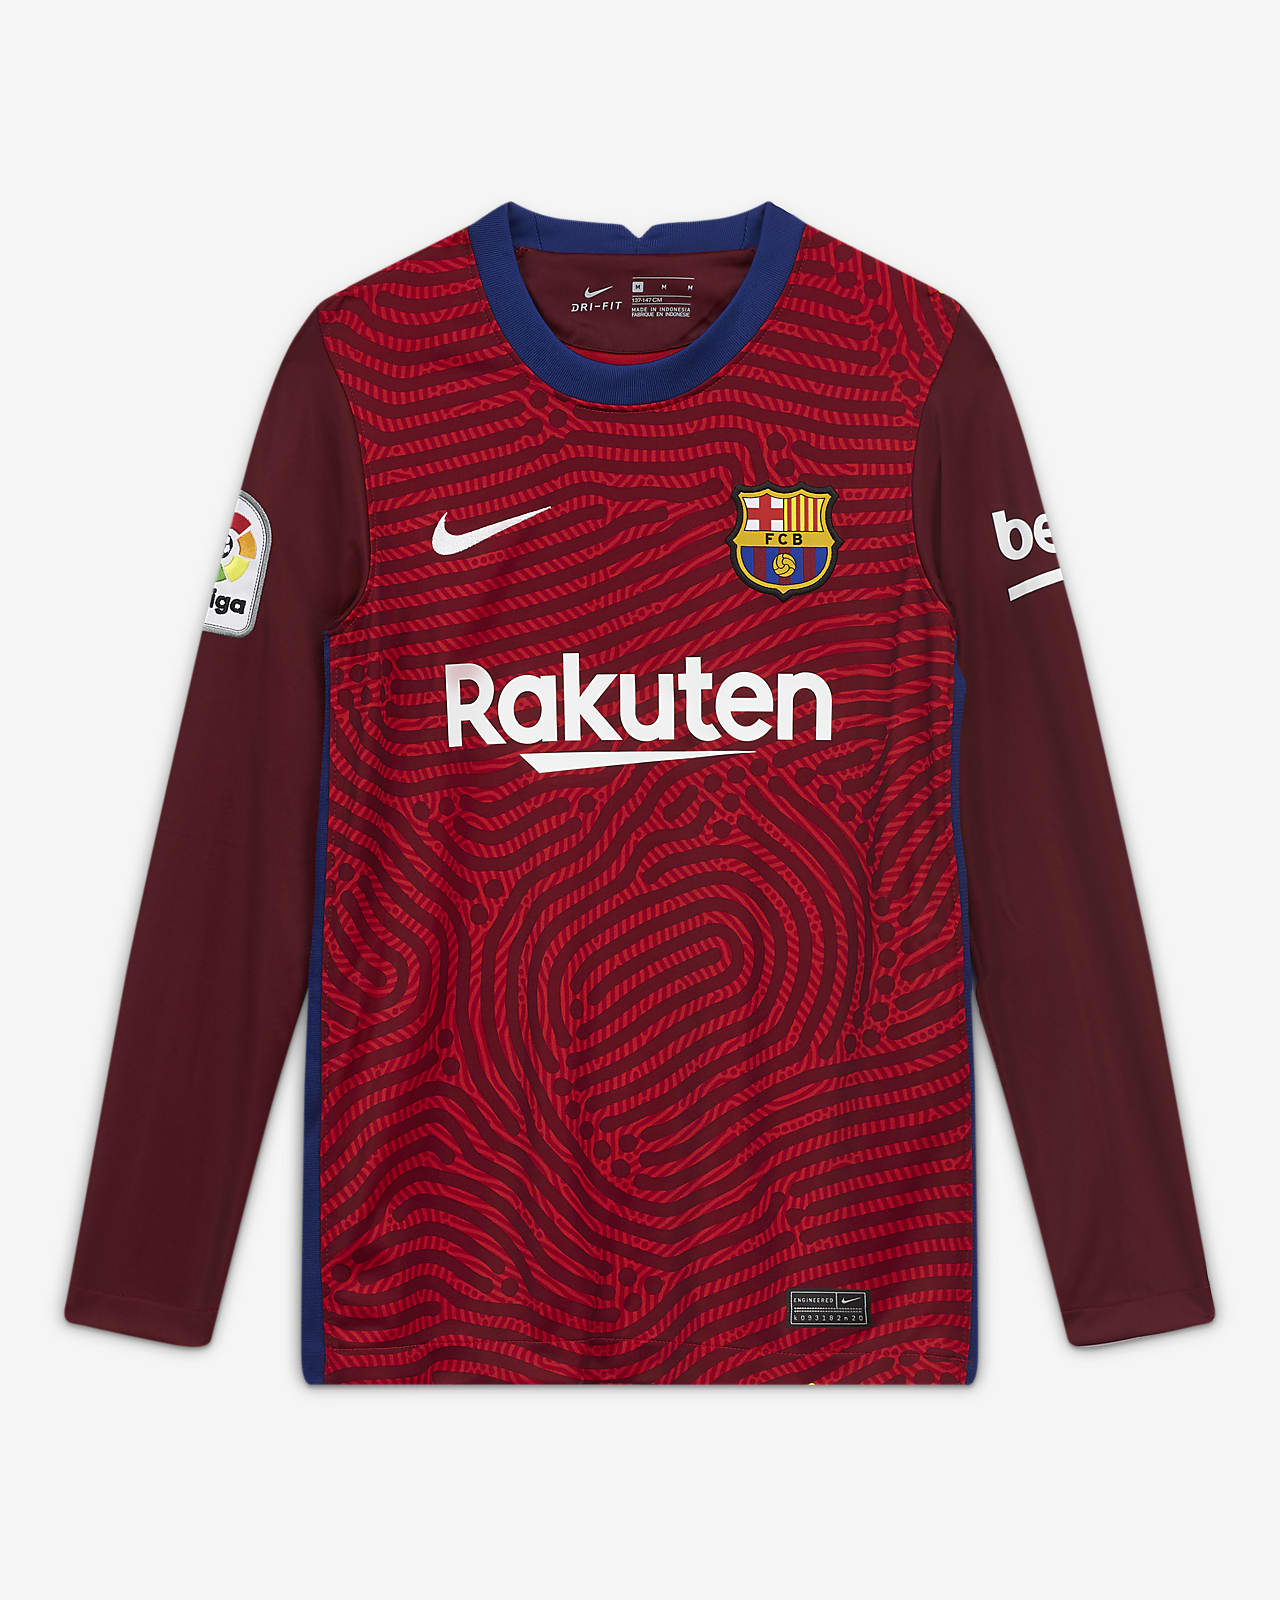 f c barcelona 2020 21 stadium goalkeeper older kids football shirt nike il f c barcelona 2020 21 stadium goalkeeper older kids football shirt